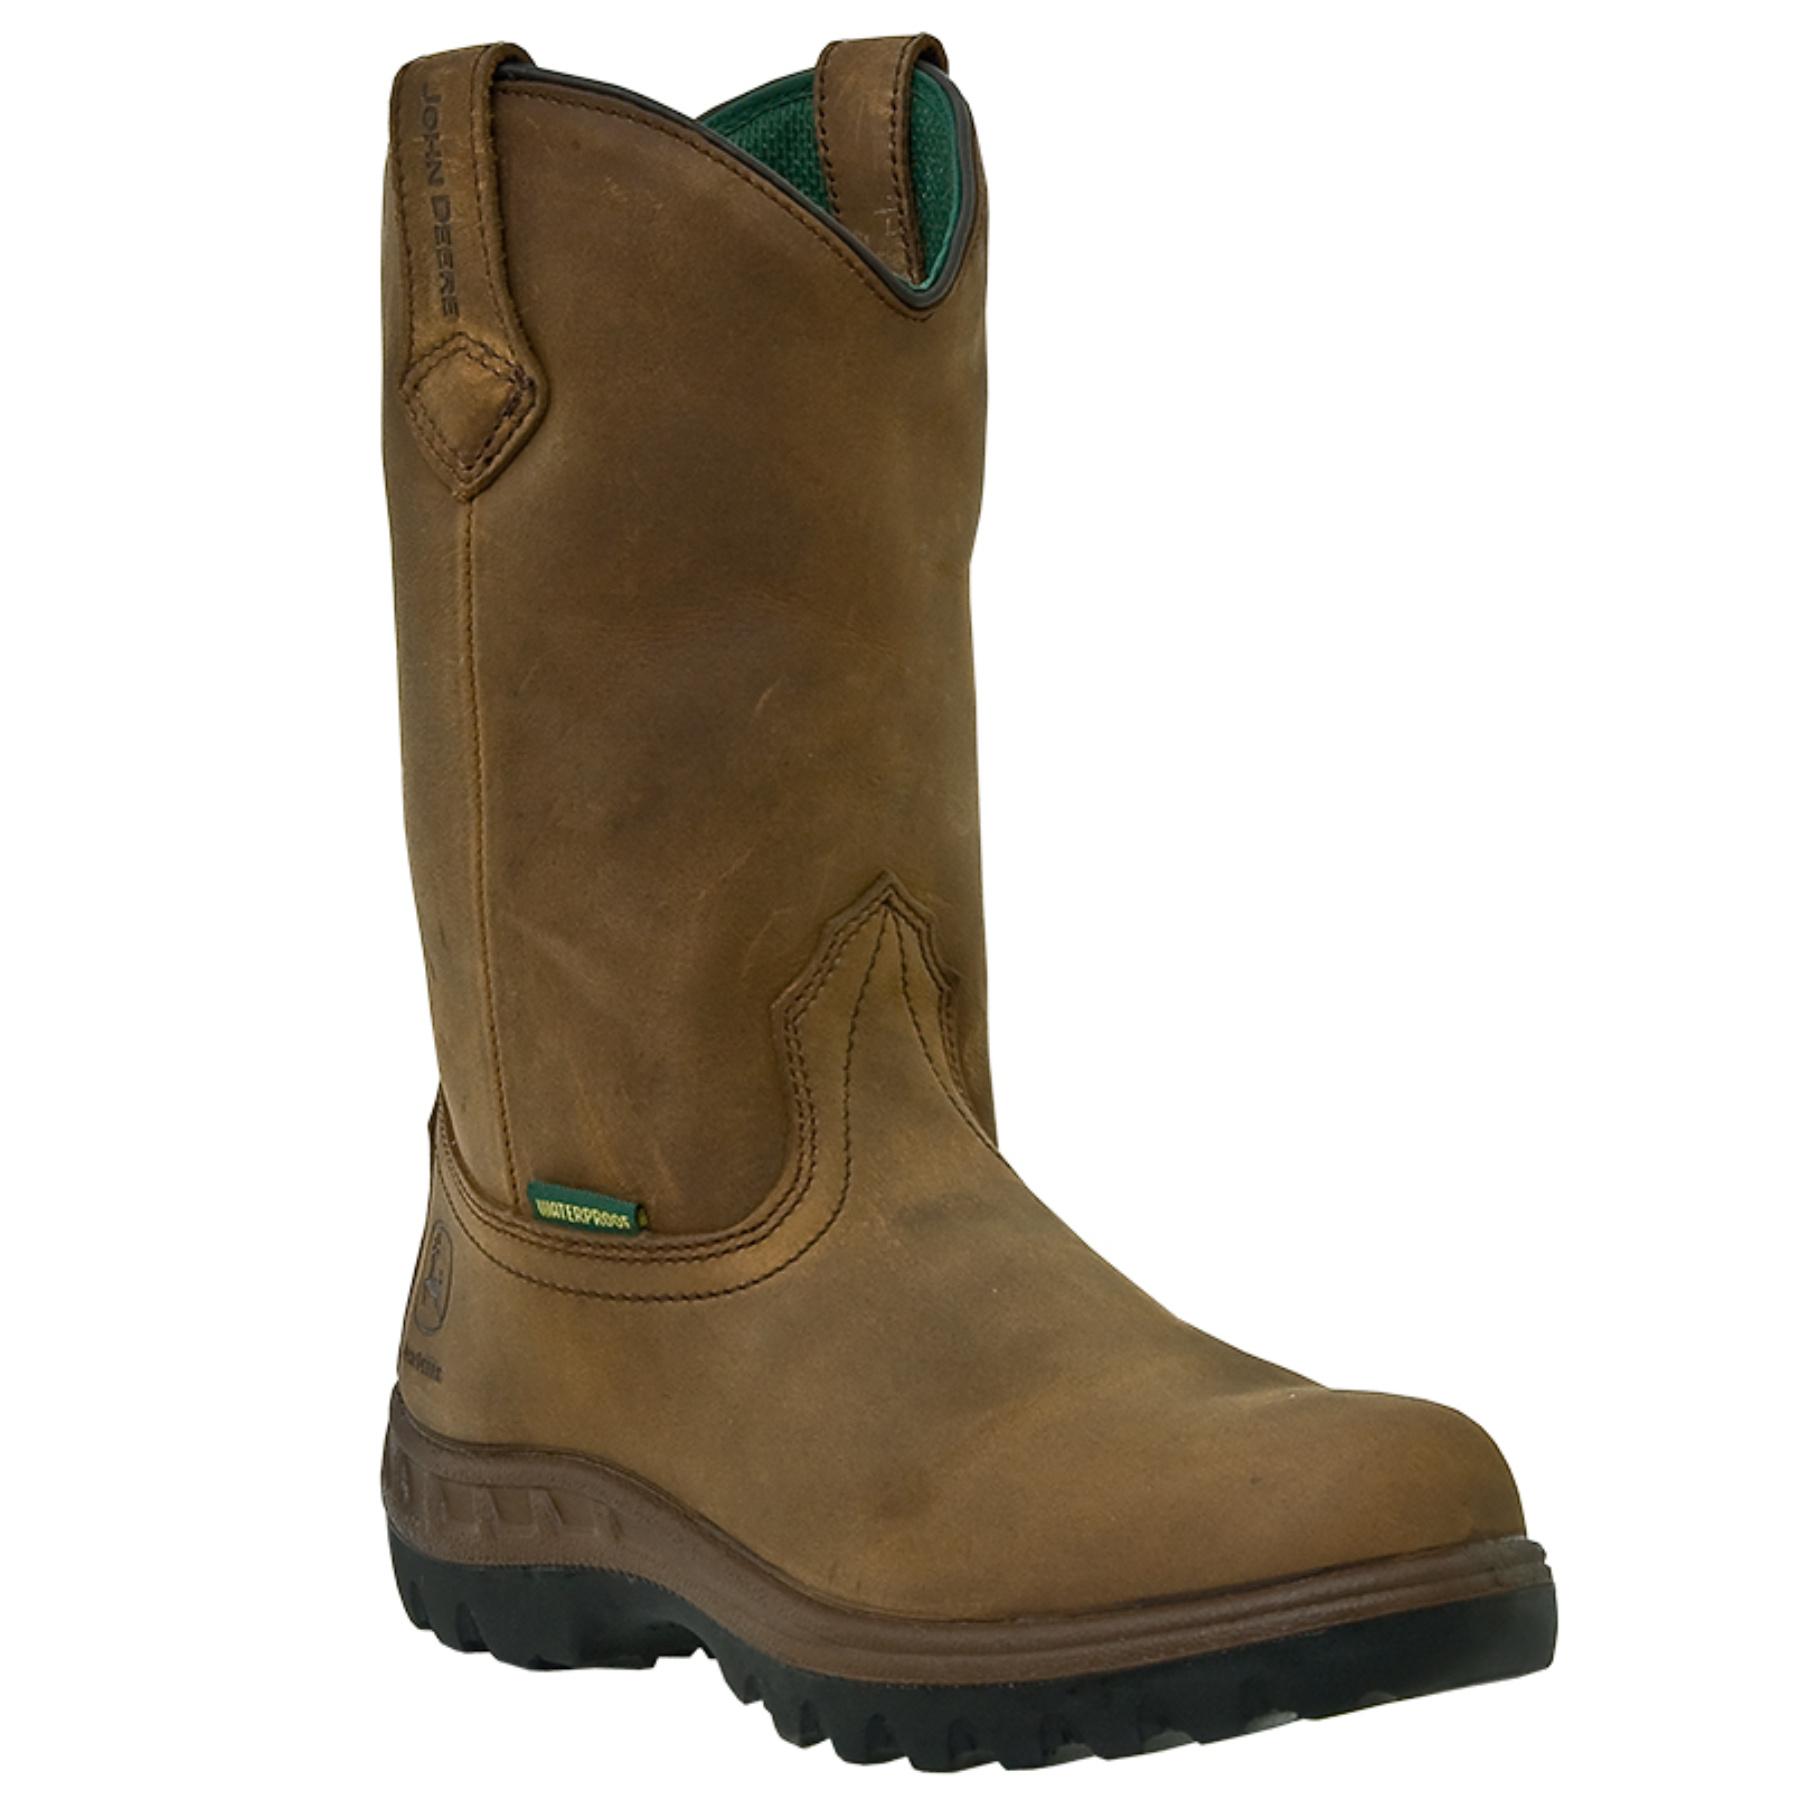 John Deere John Deere Men'S Brown Leather Boots 8 W - Pricefalls.com